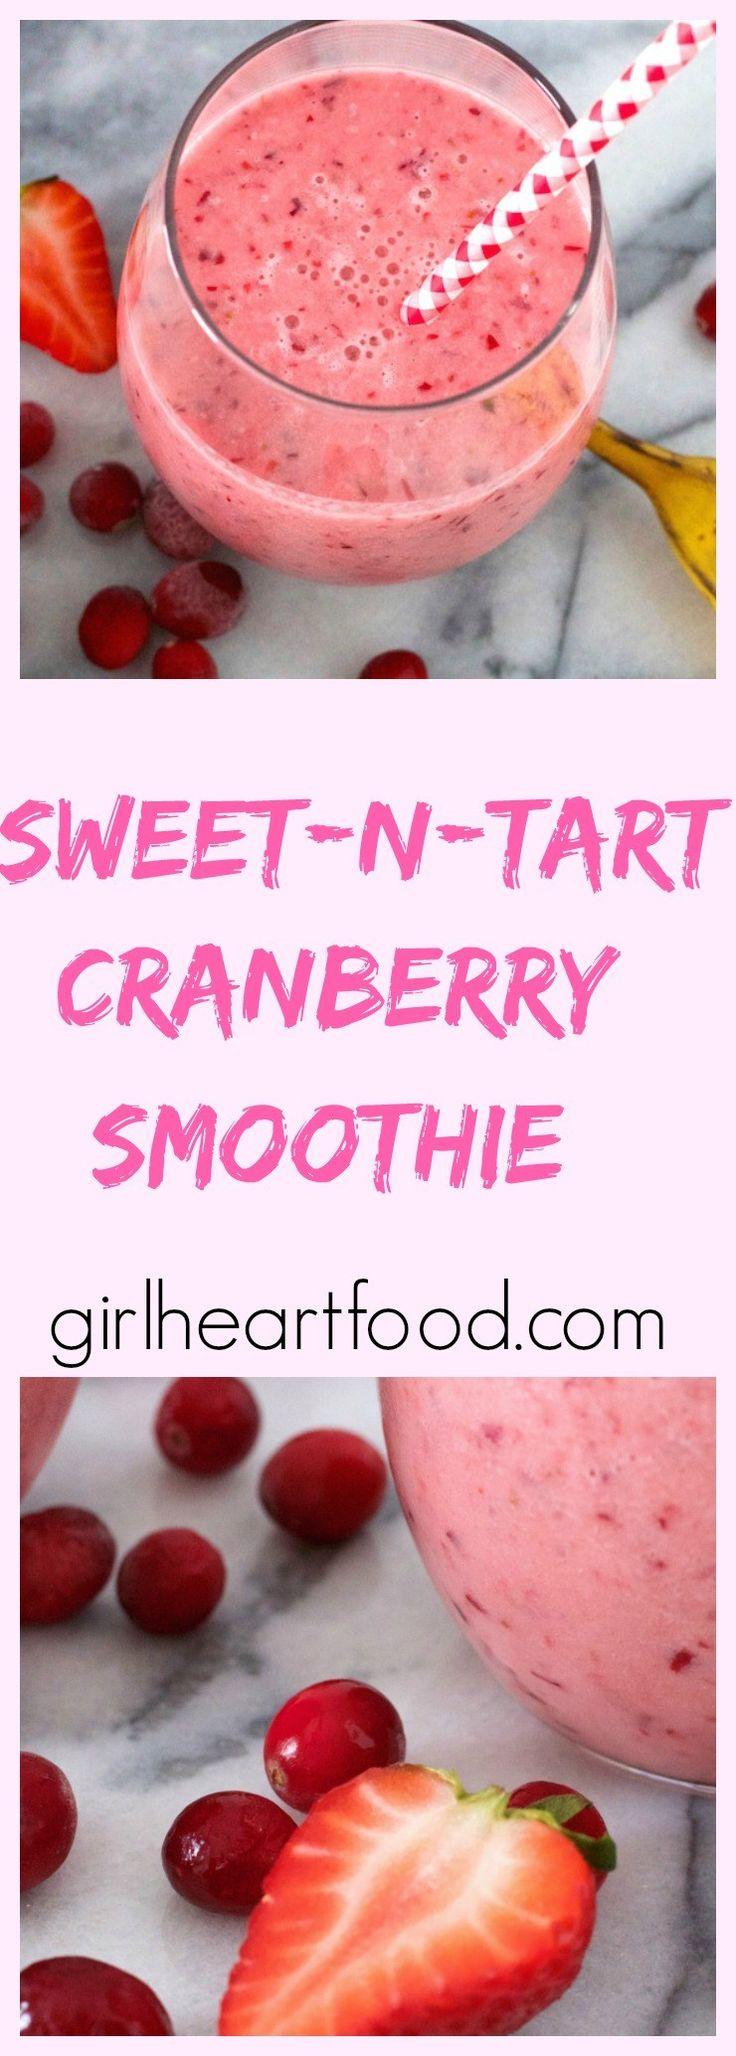 Sweet n Tart Cranberry Smoothie - girlheartfood.com